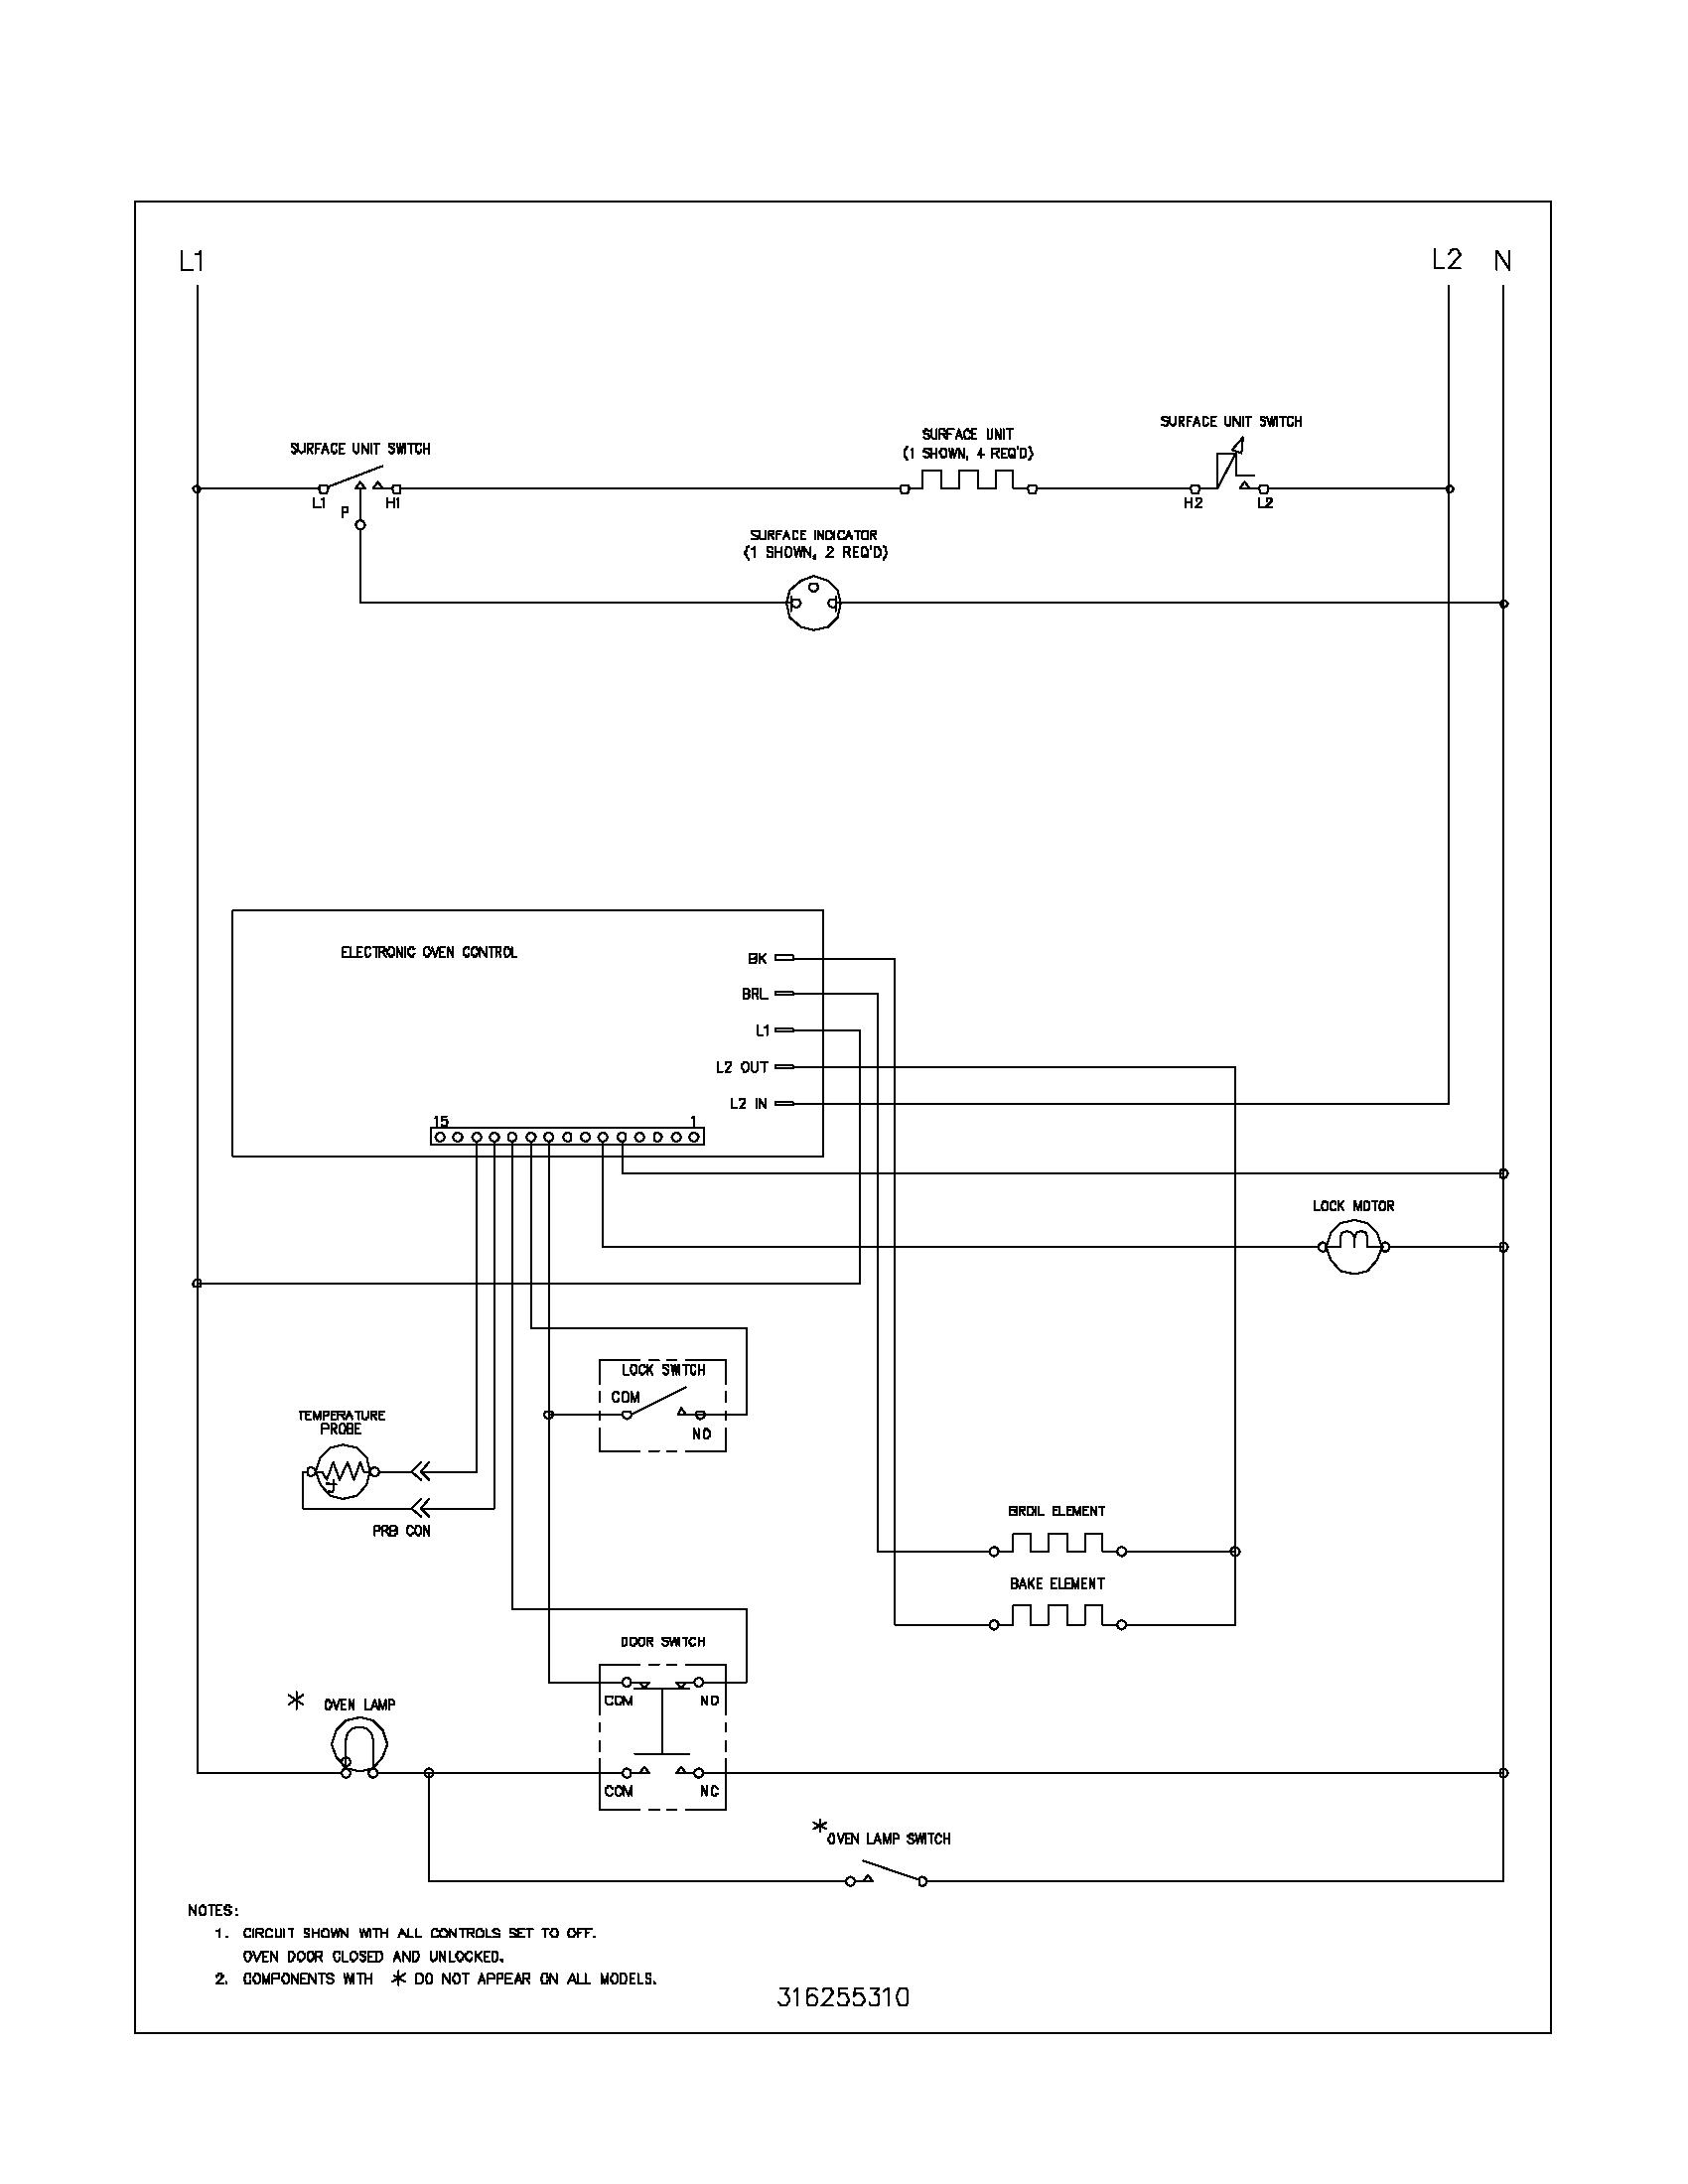 Kenmore Refrigerator Wiring Diagram Kenmore Refrigerator – Kenmore Laundry Center Wiring Diagrams